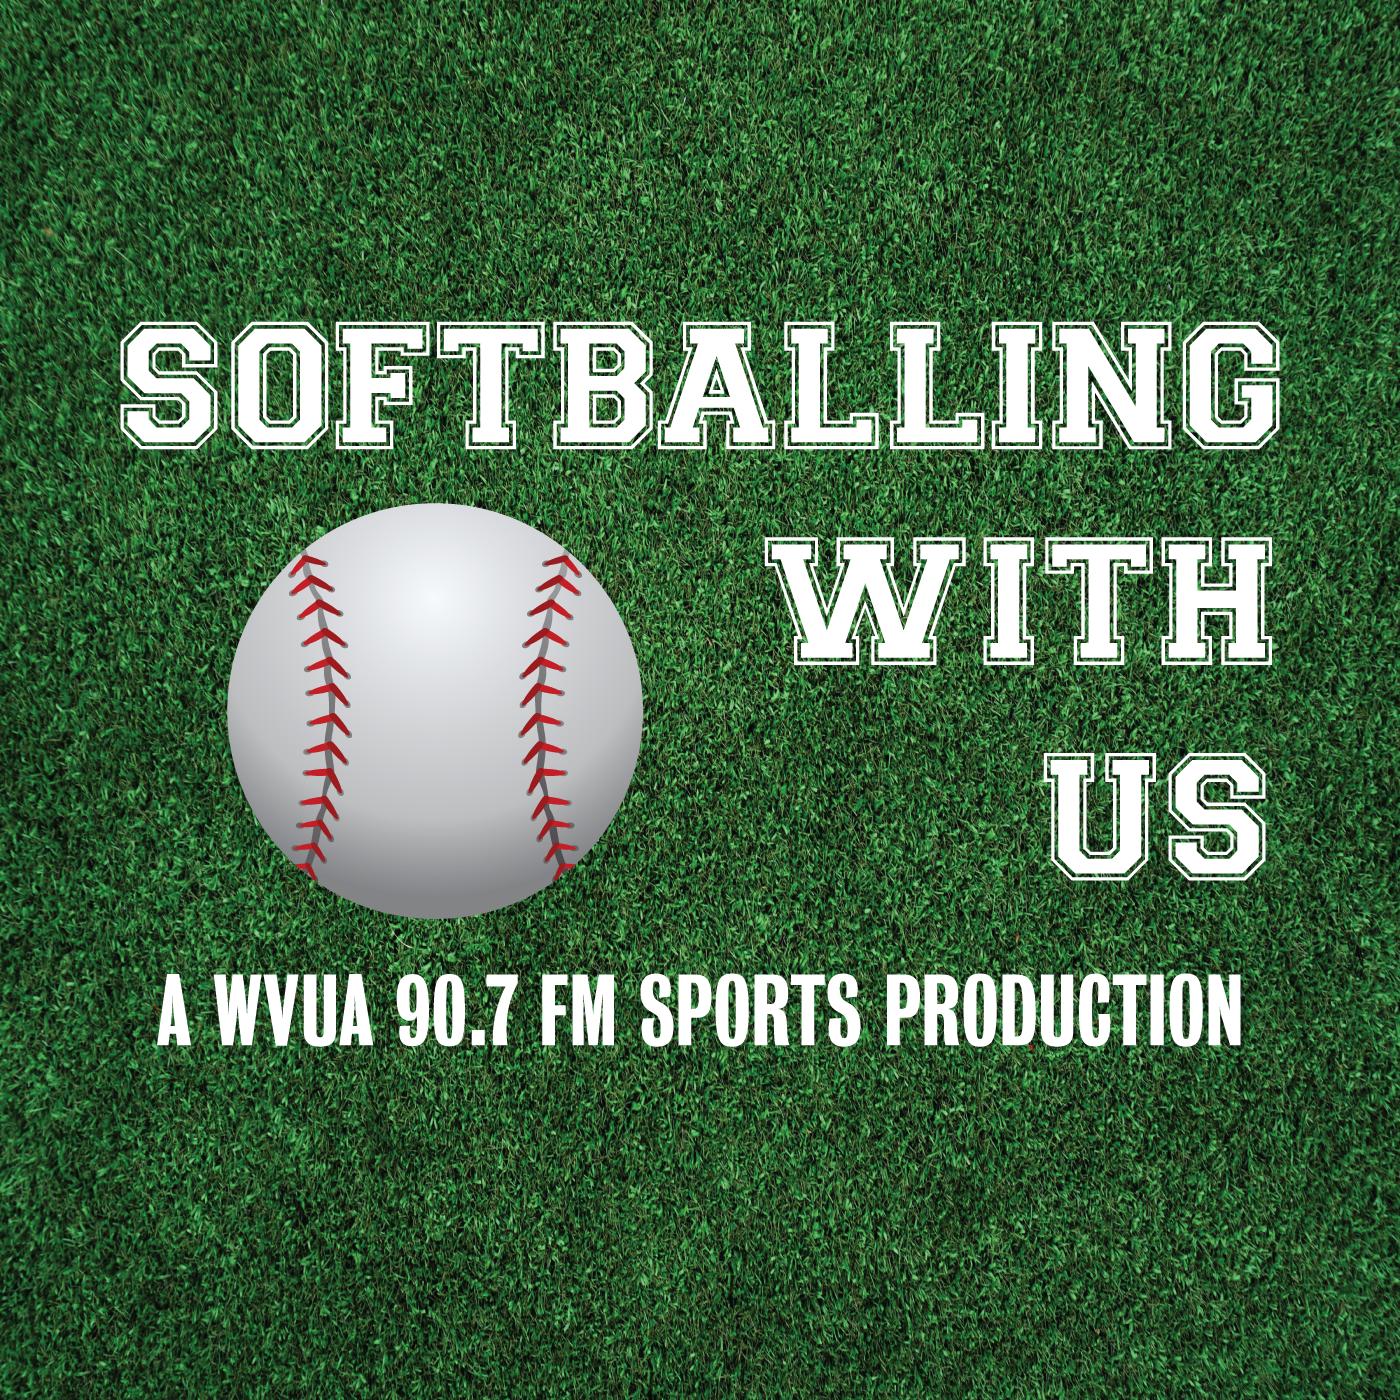 Softballing With Us   A WVUA 90.7 FM Sports Podcast